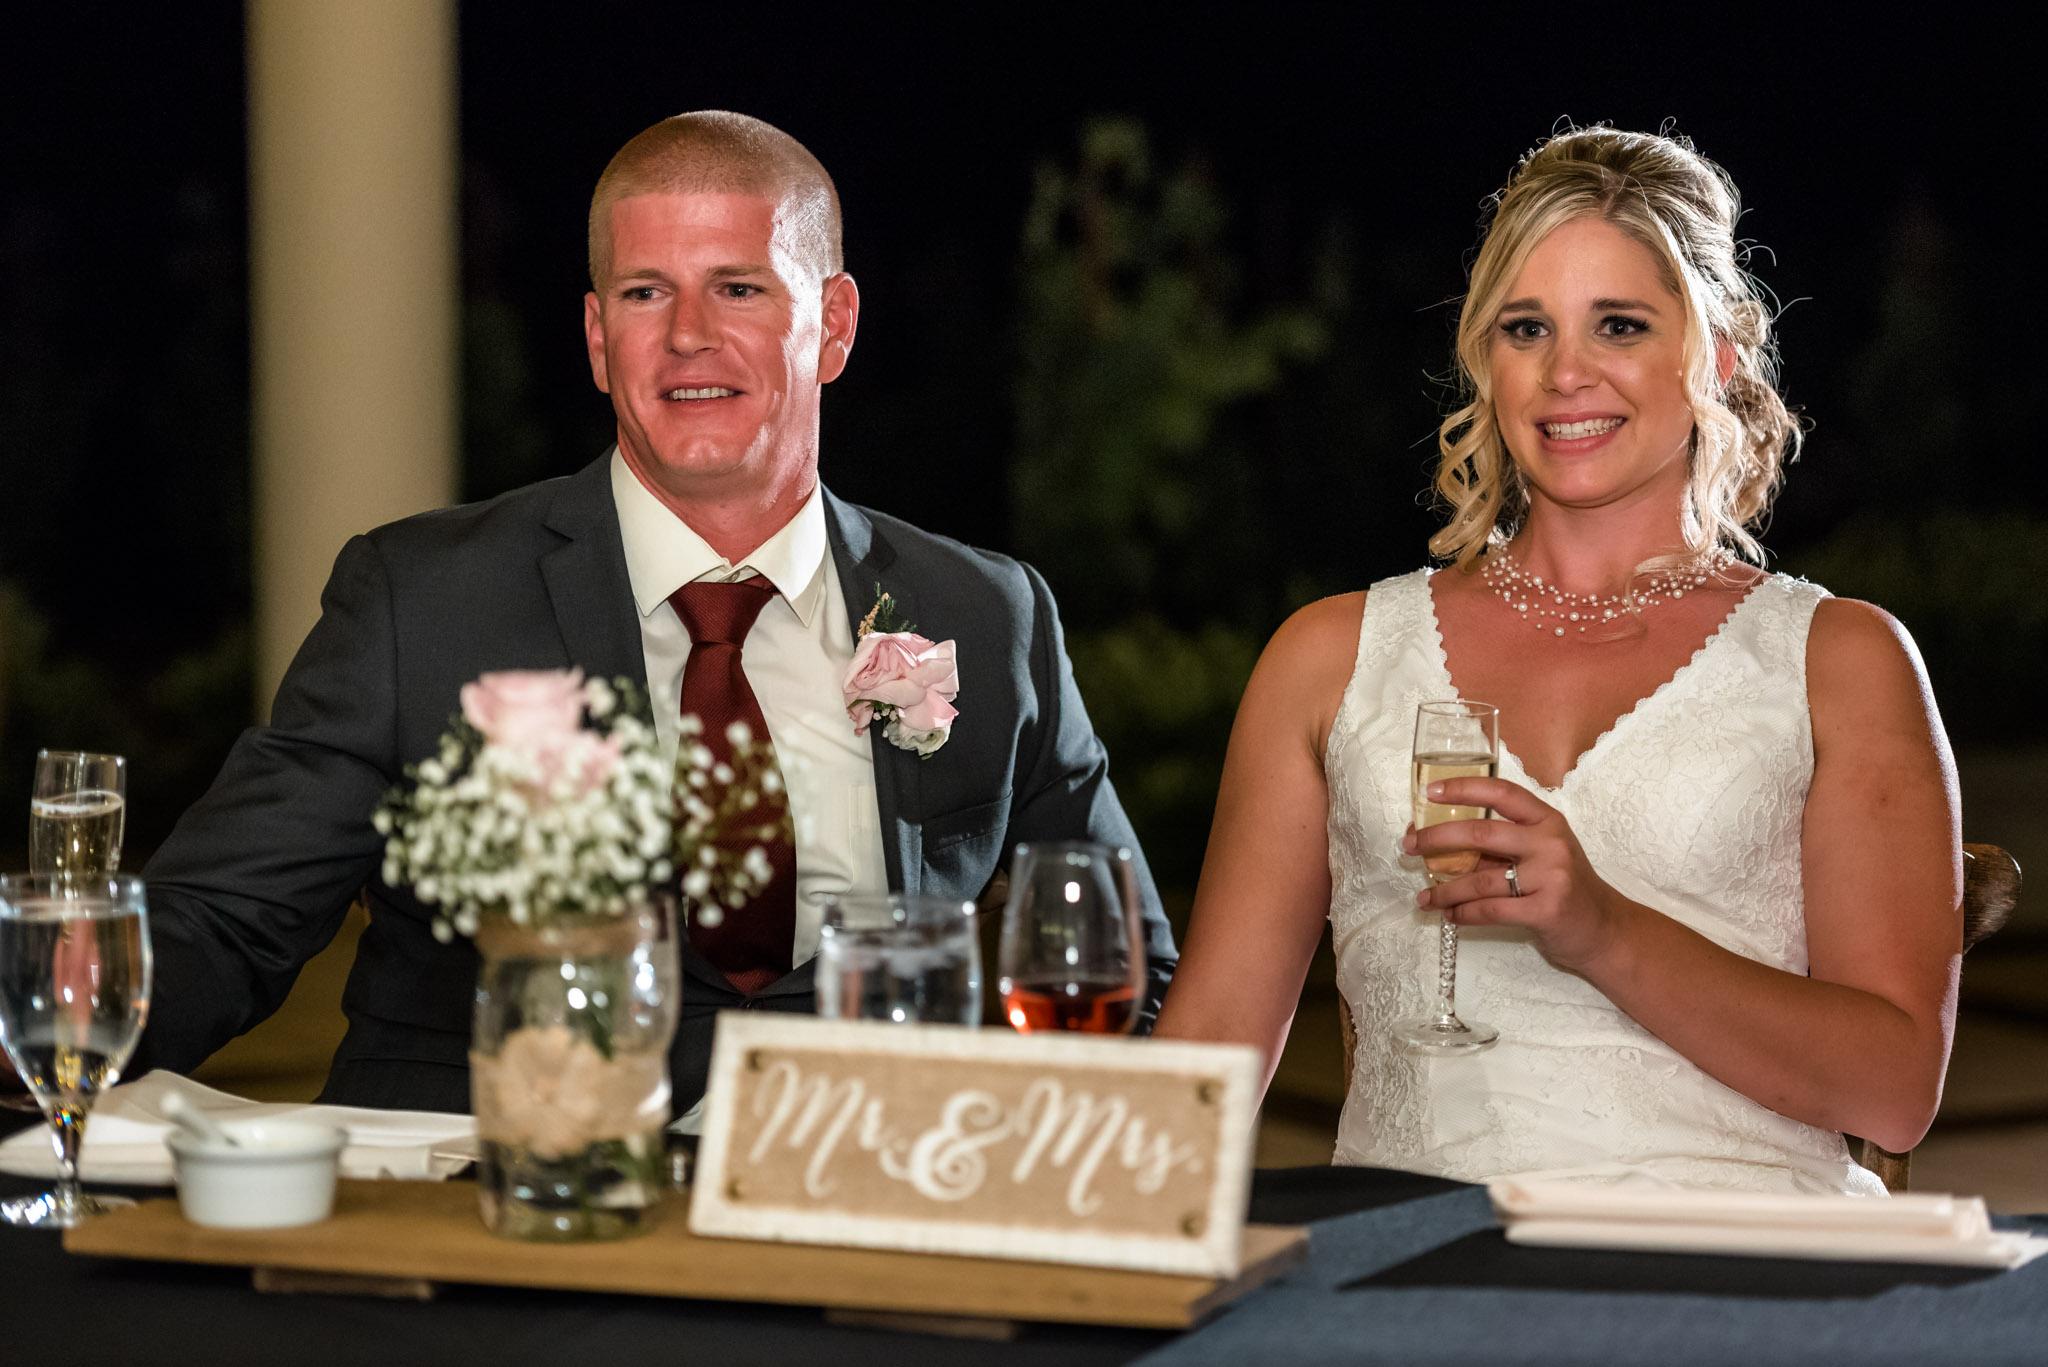 Avensole-Winery-Temecula-Wedding-Josh-and-Olivia-4030.JPG